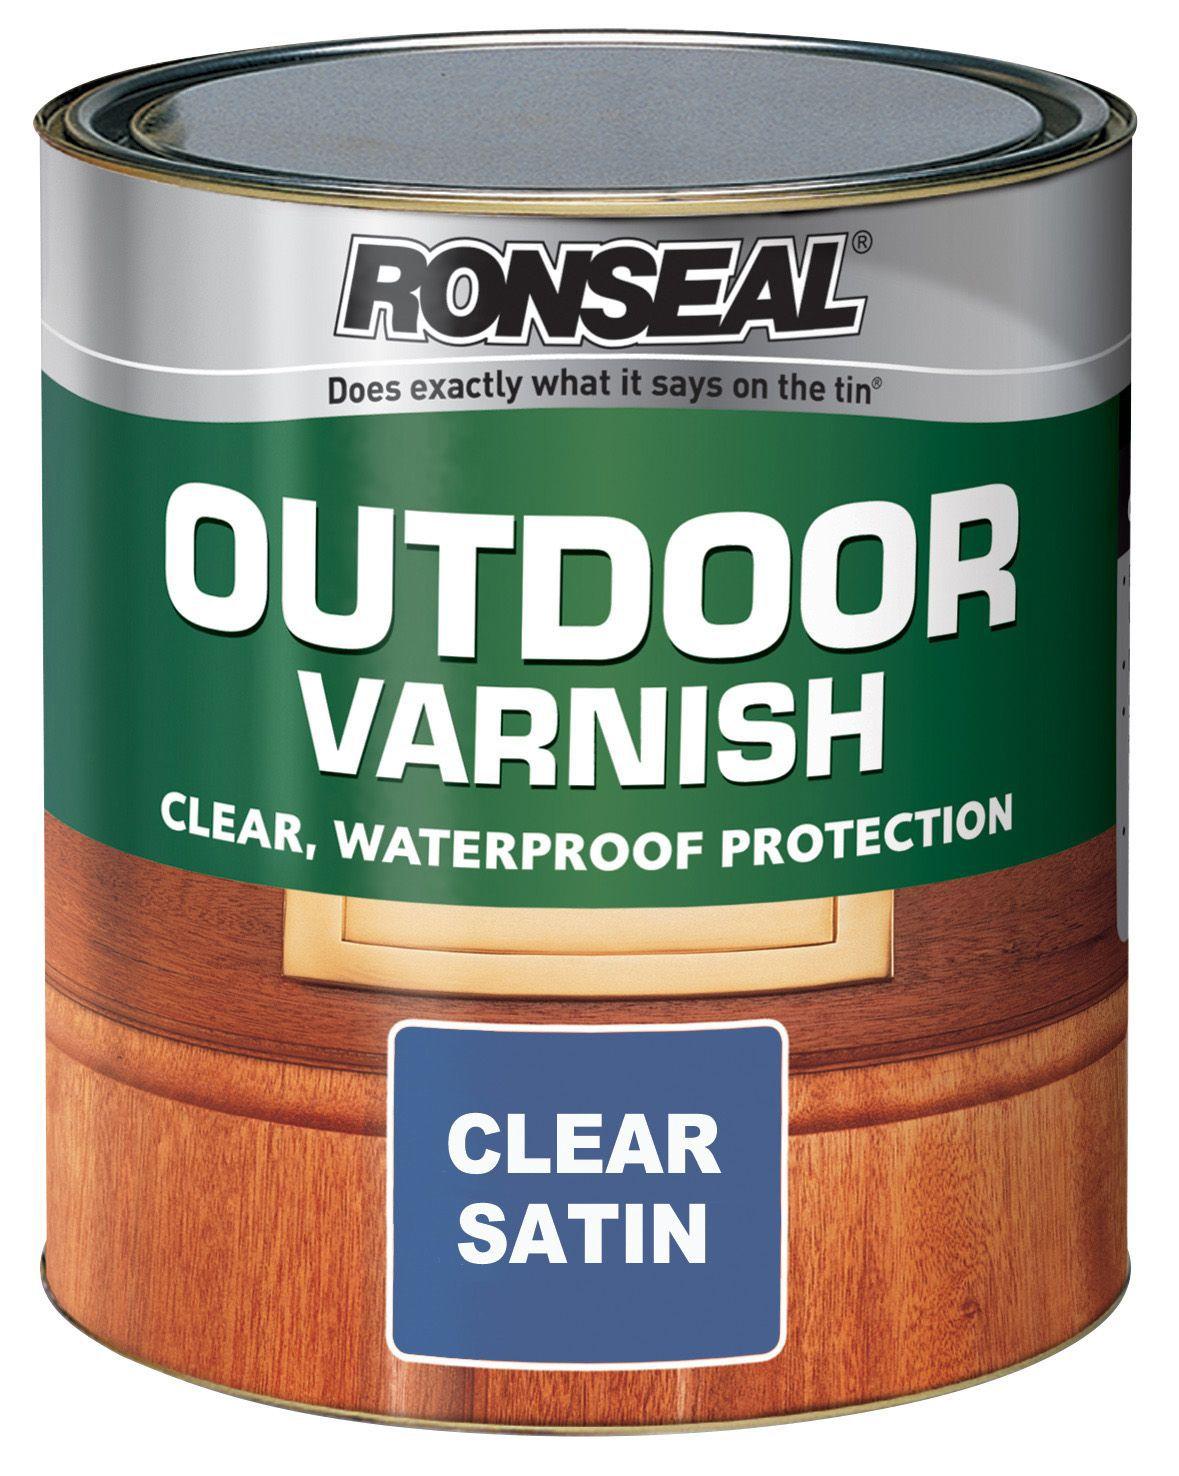 Ronseal Satin Outdoor Varnish 2500ml | Departments | DIY At Bu0026Q.